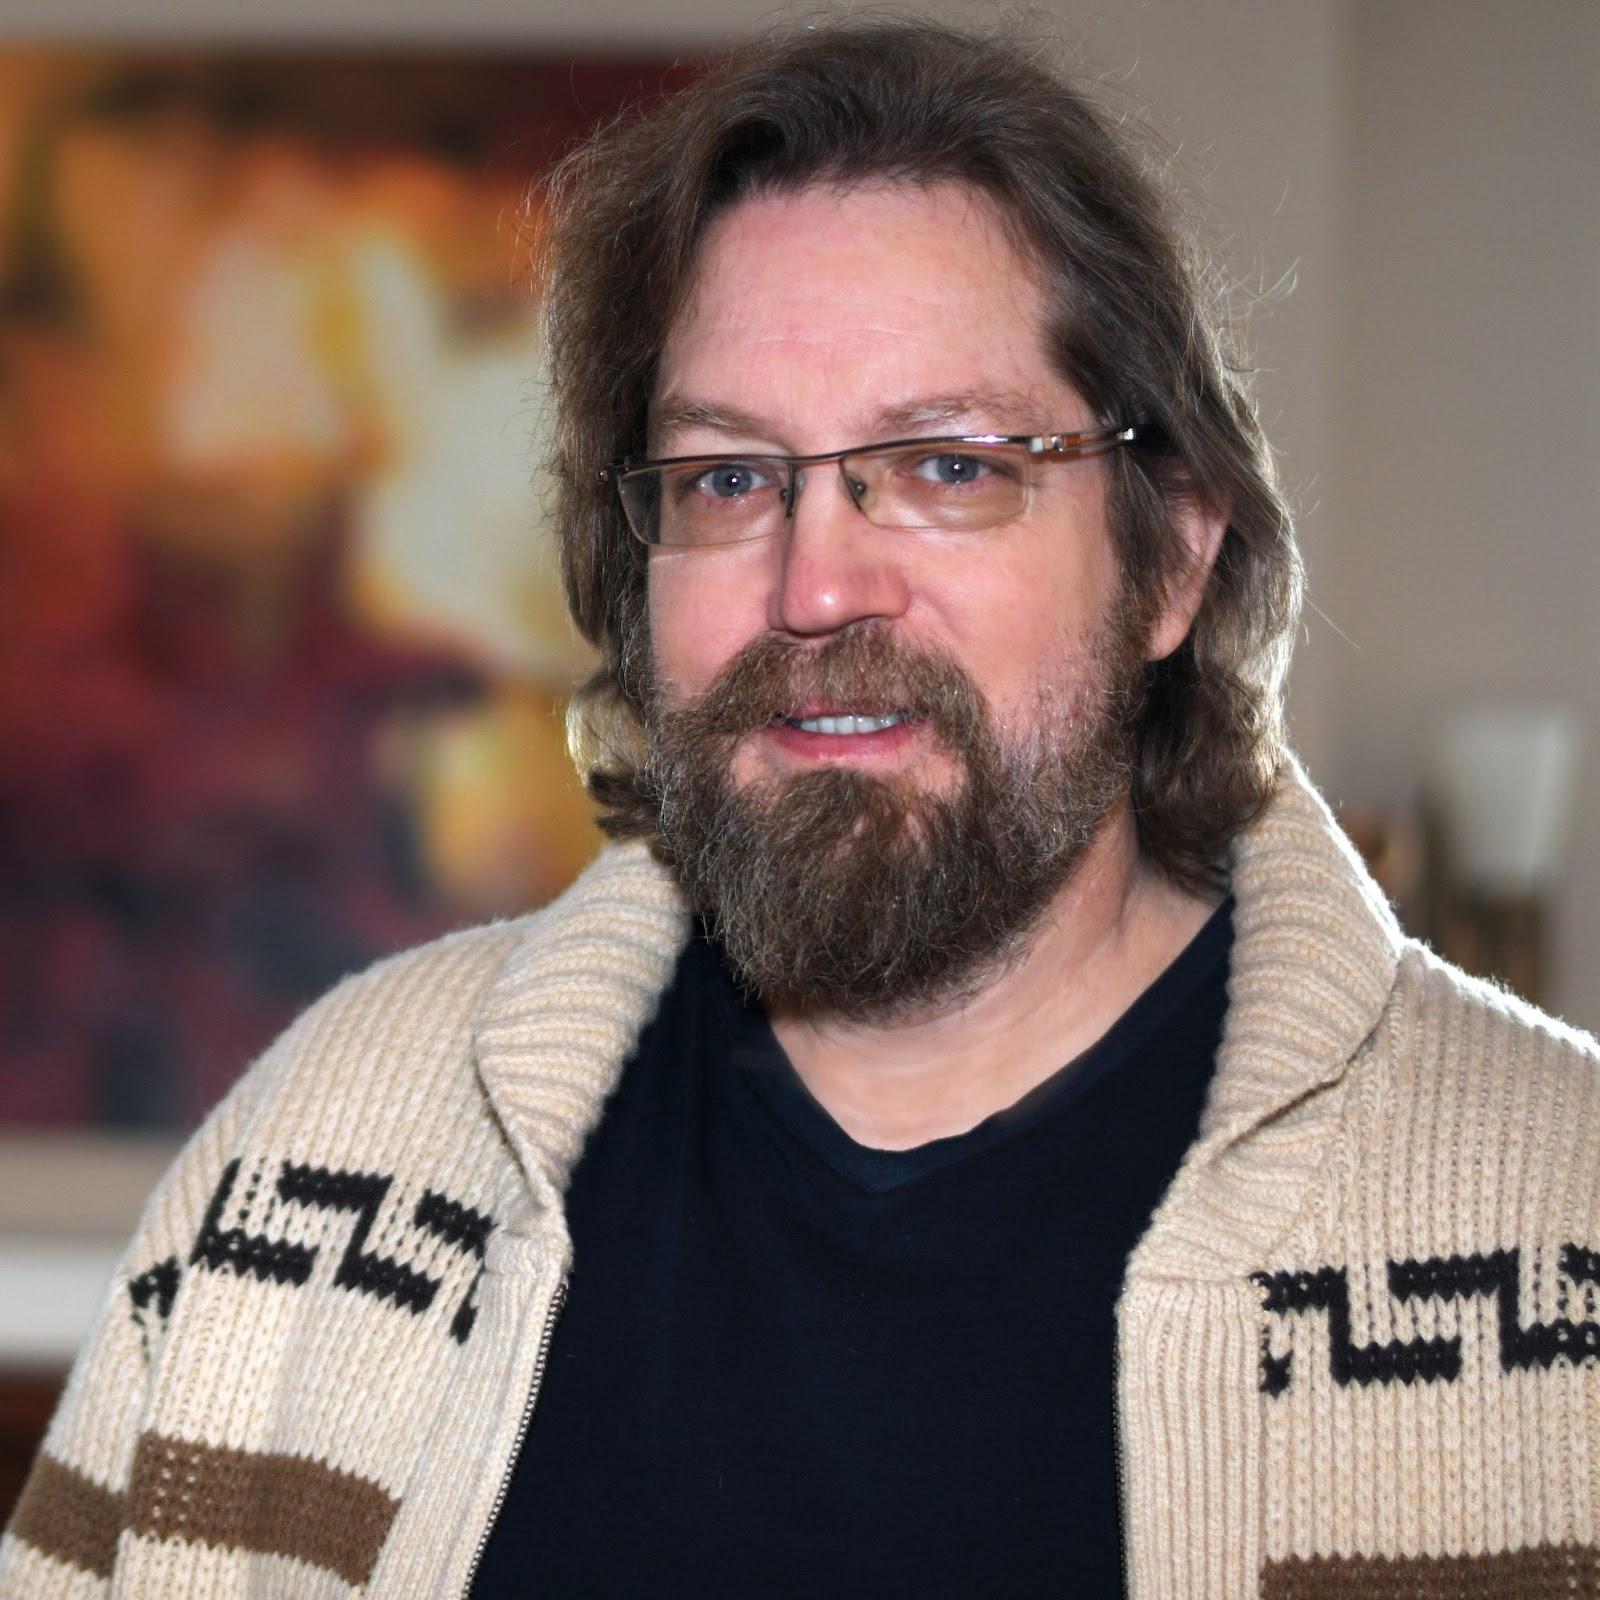 Portrait of bearded white man